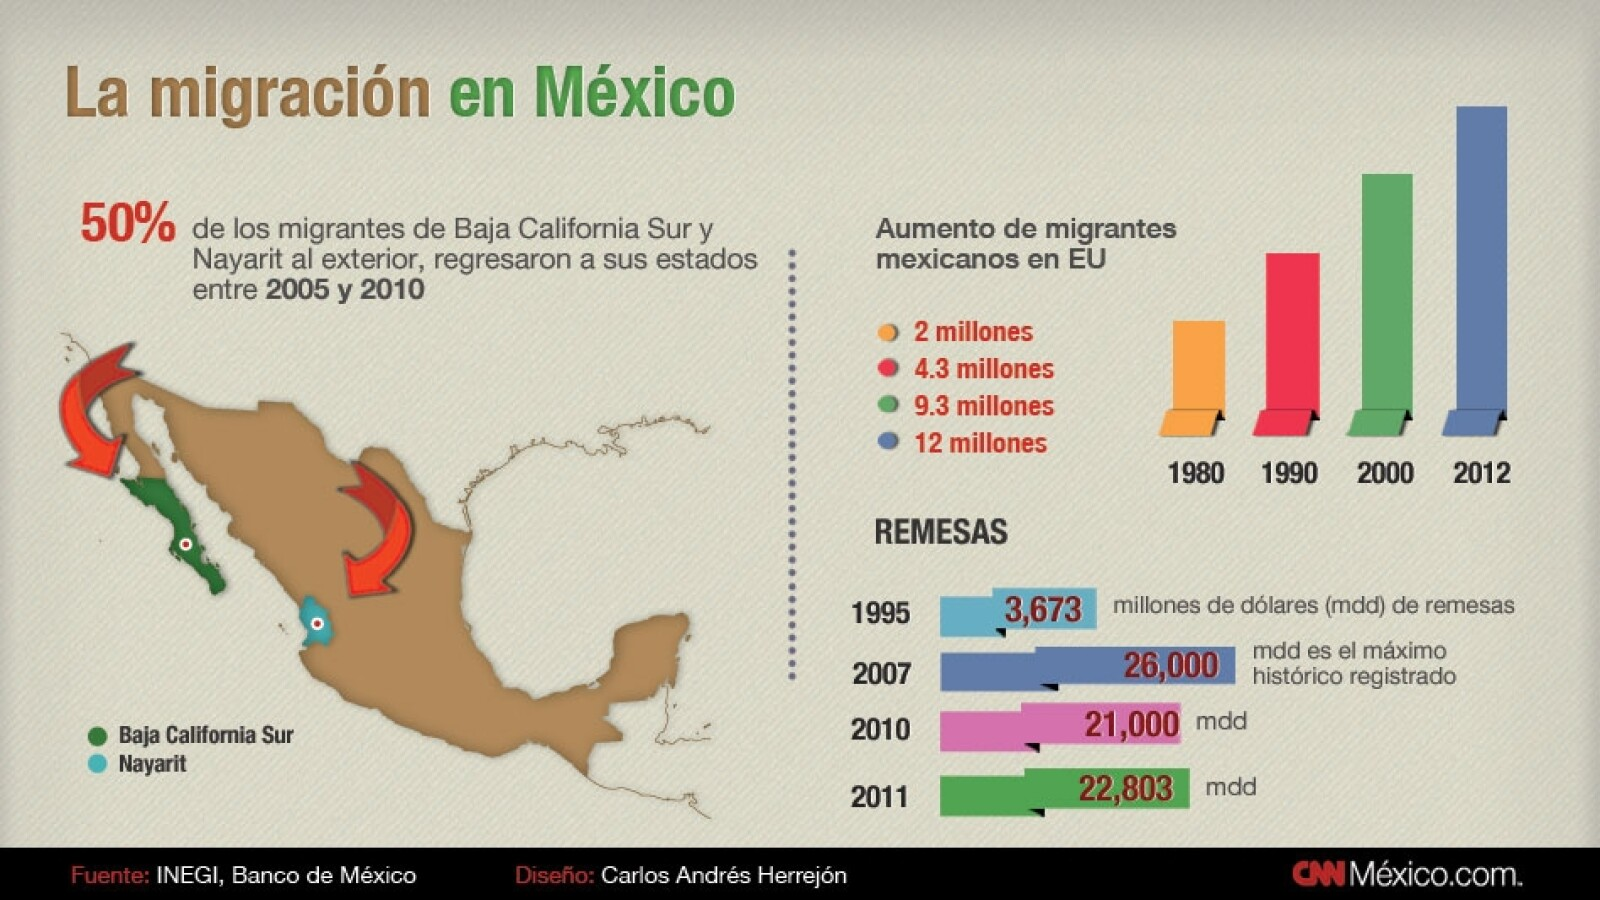 migracion mexico 4 ok